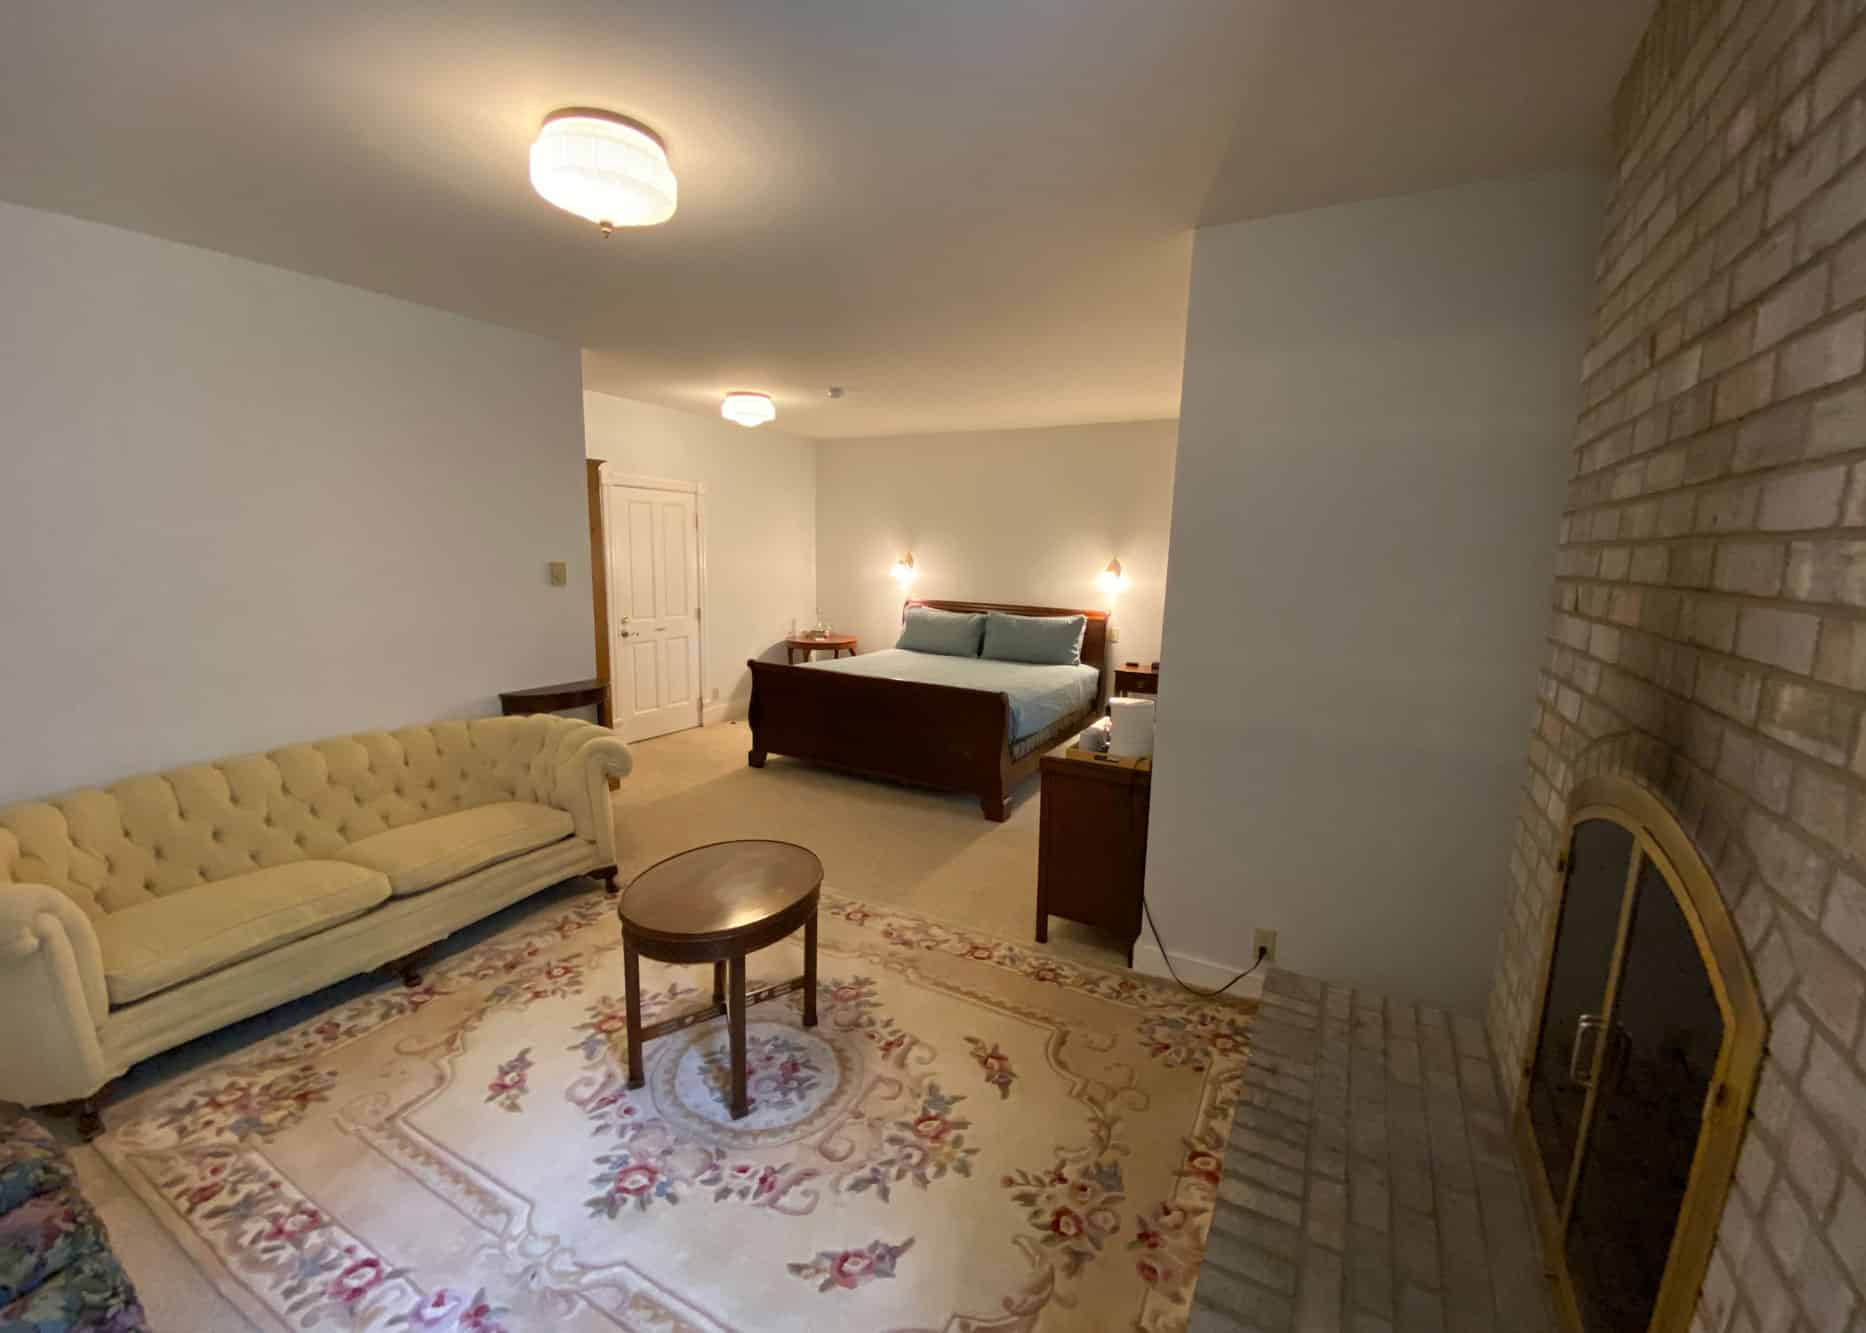 the-edenwild-inn-lopez-island-lodging-2020-room-02-02